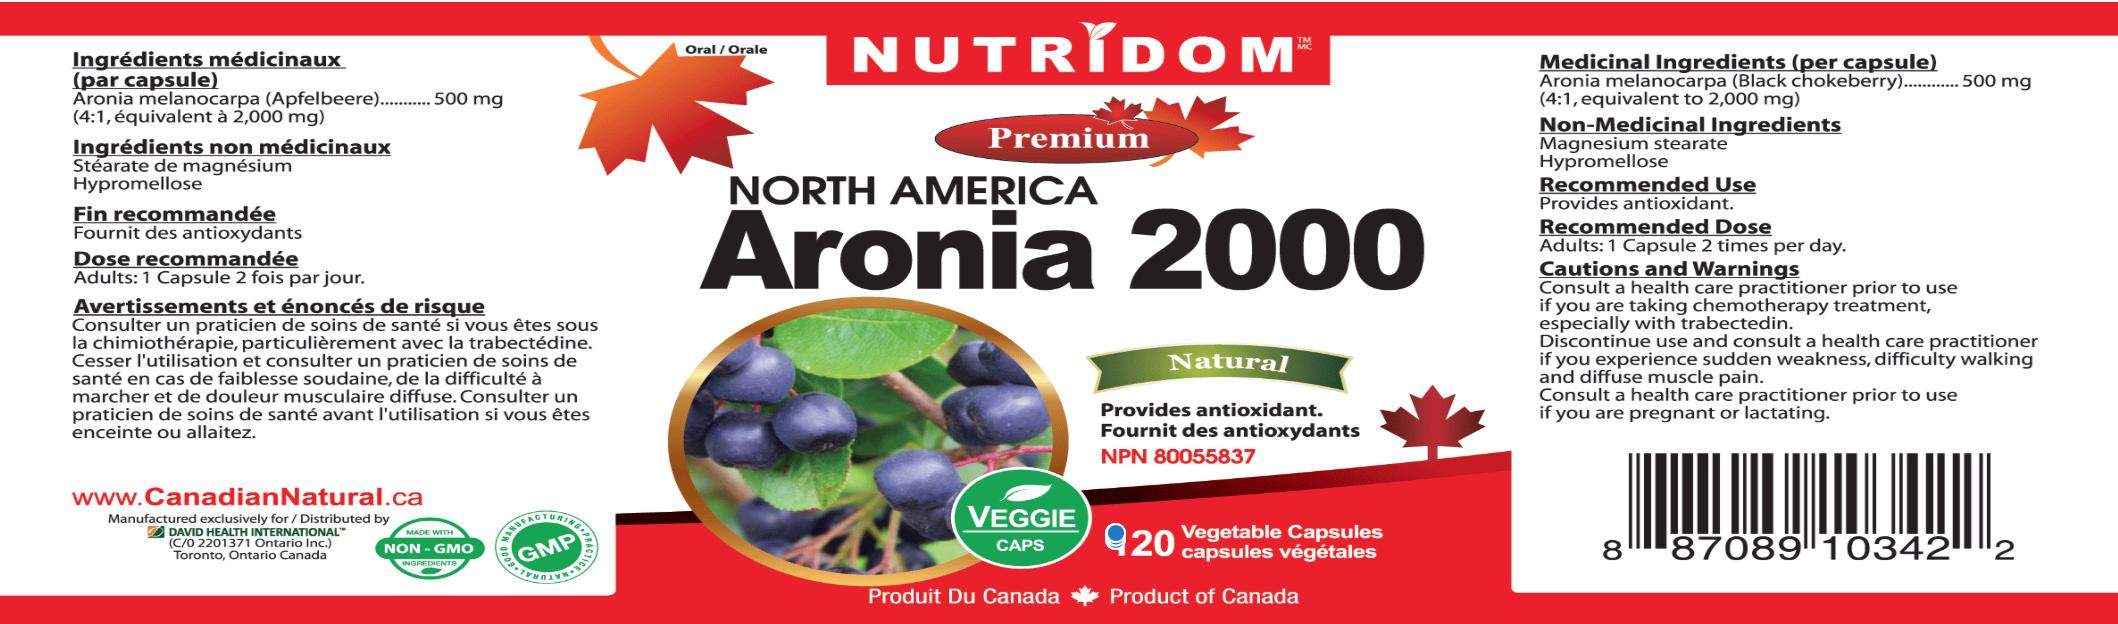 nutridom-aronia-2000-.png